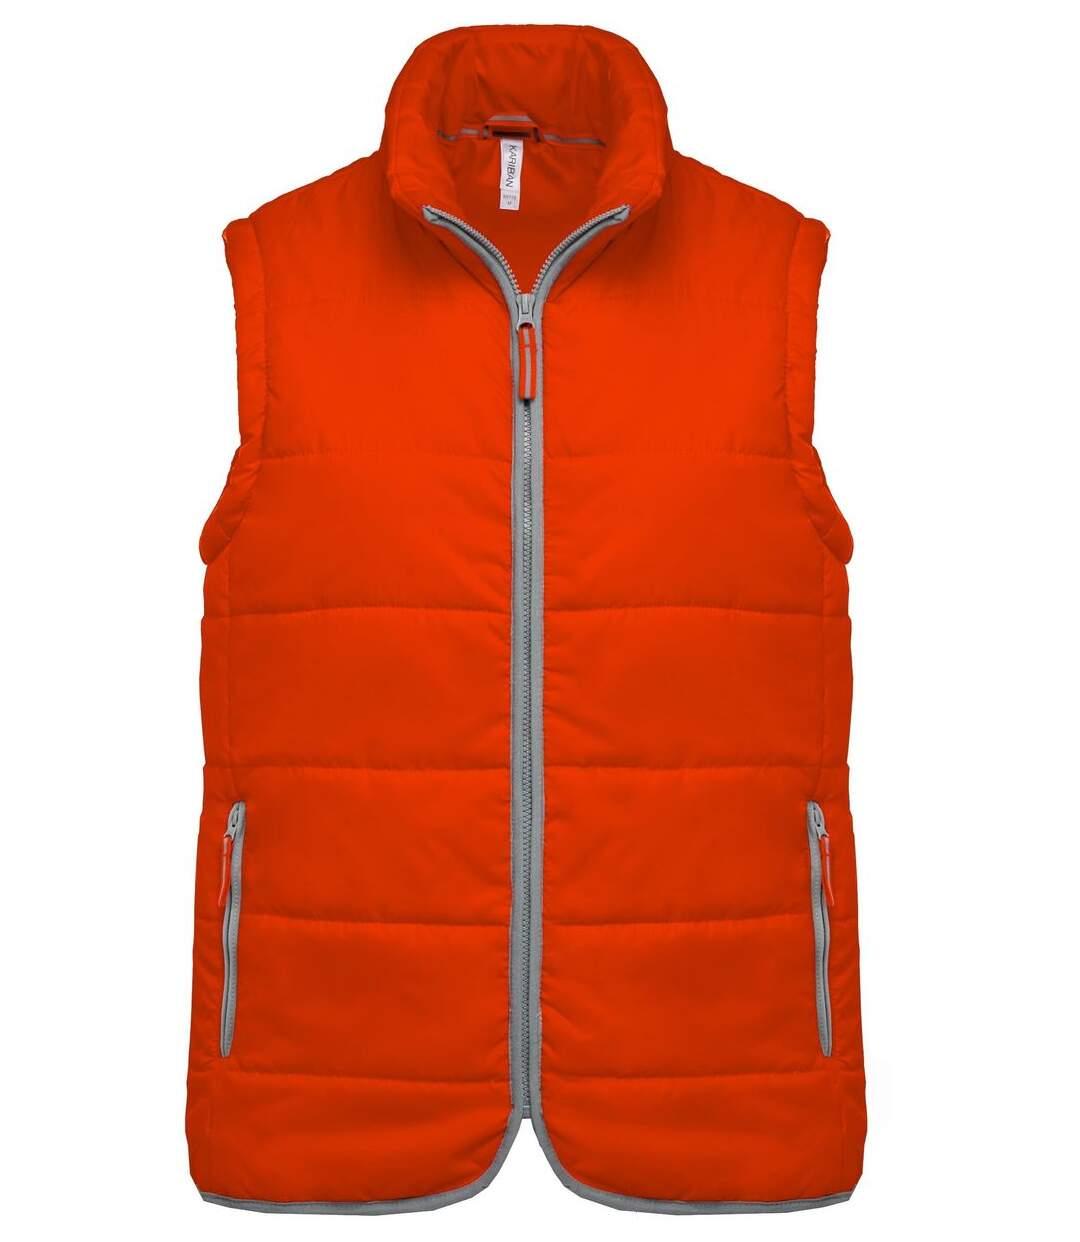 Doudoune sans manches - K6116 - orange - bodywarmer matelassé